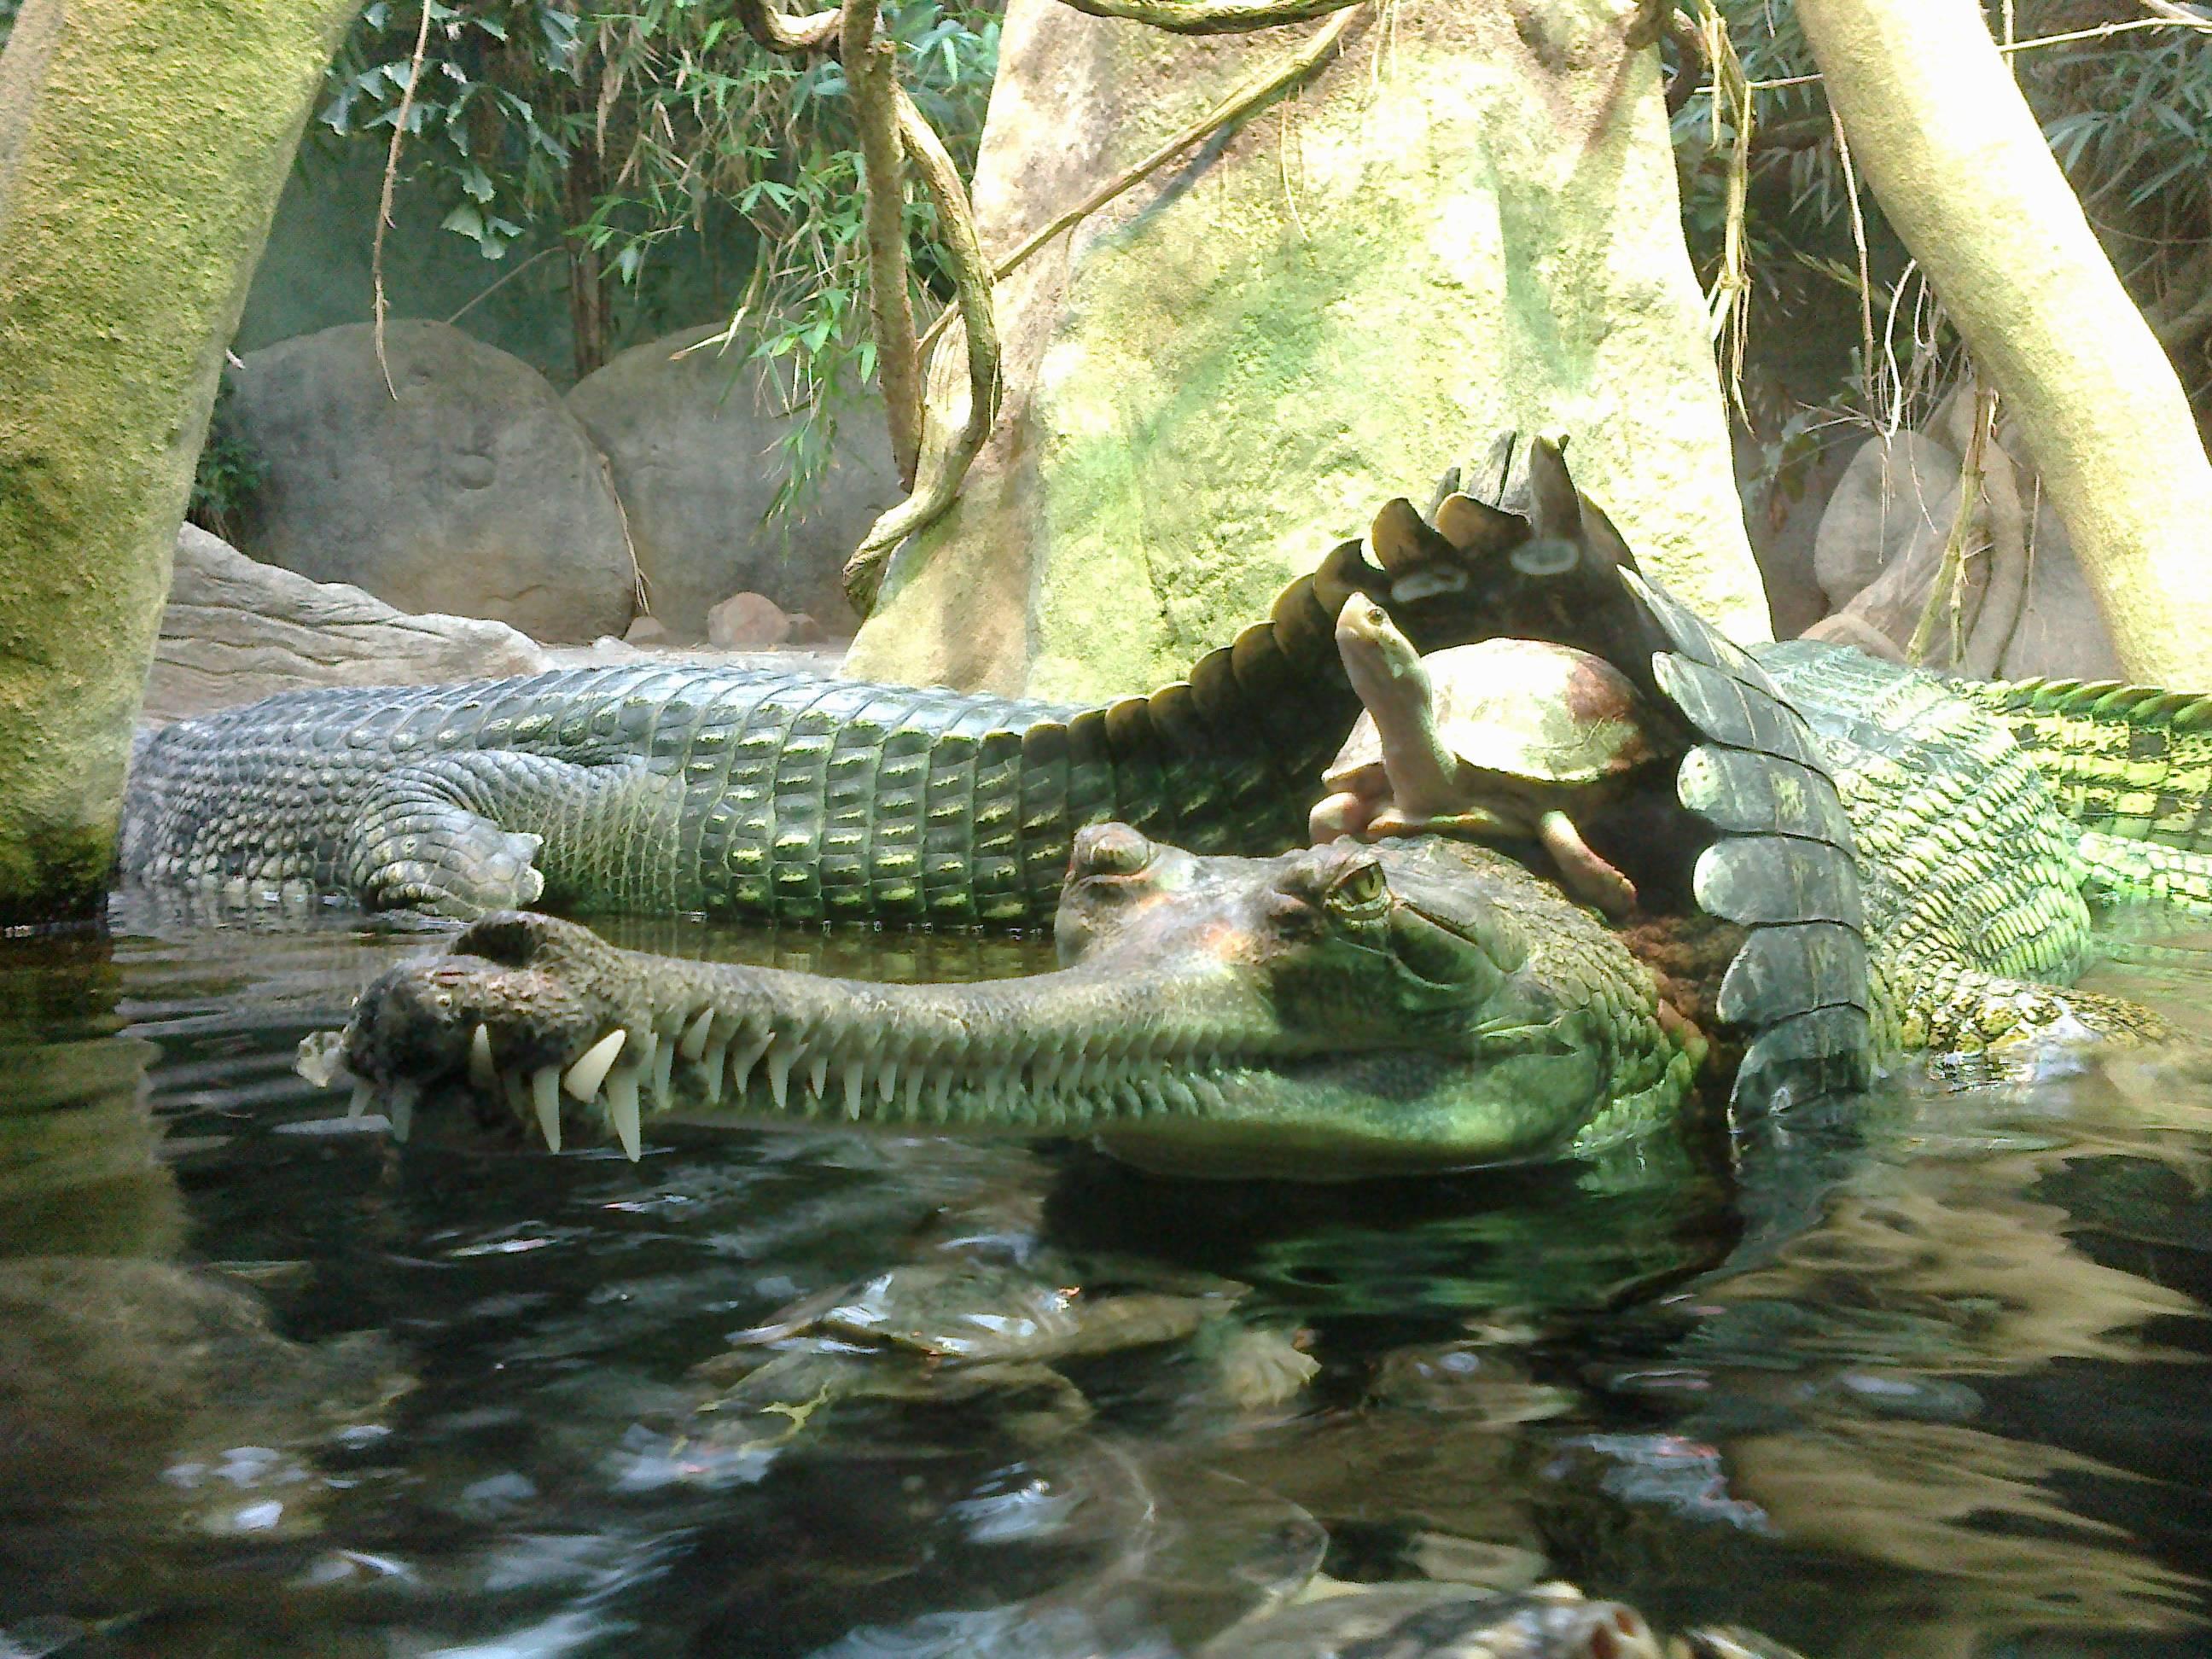 cherepaha na krokodile foto